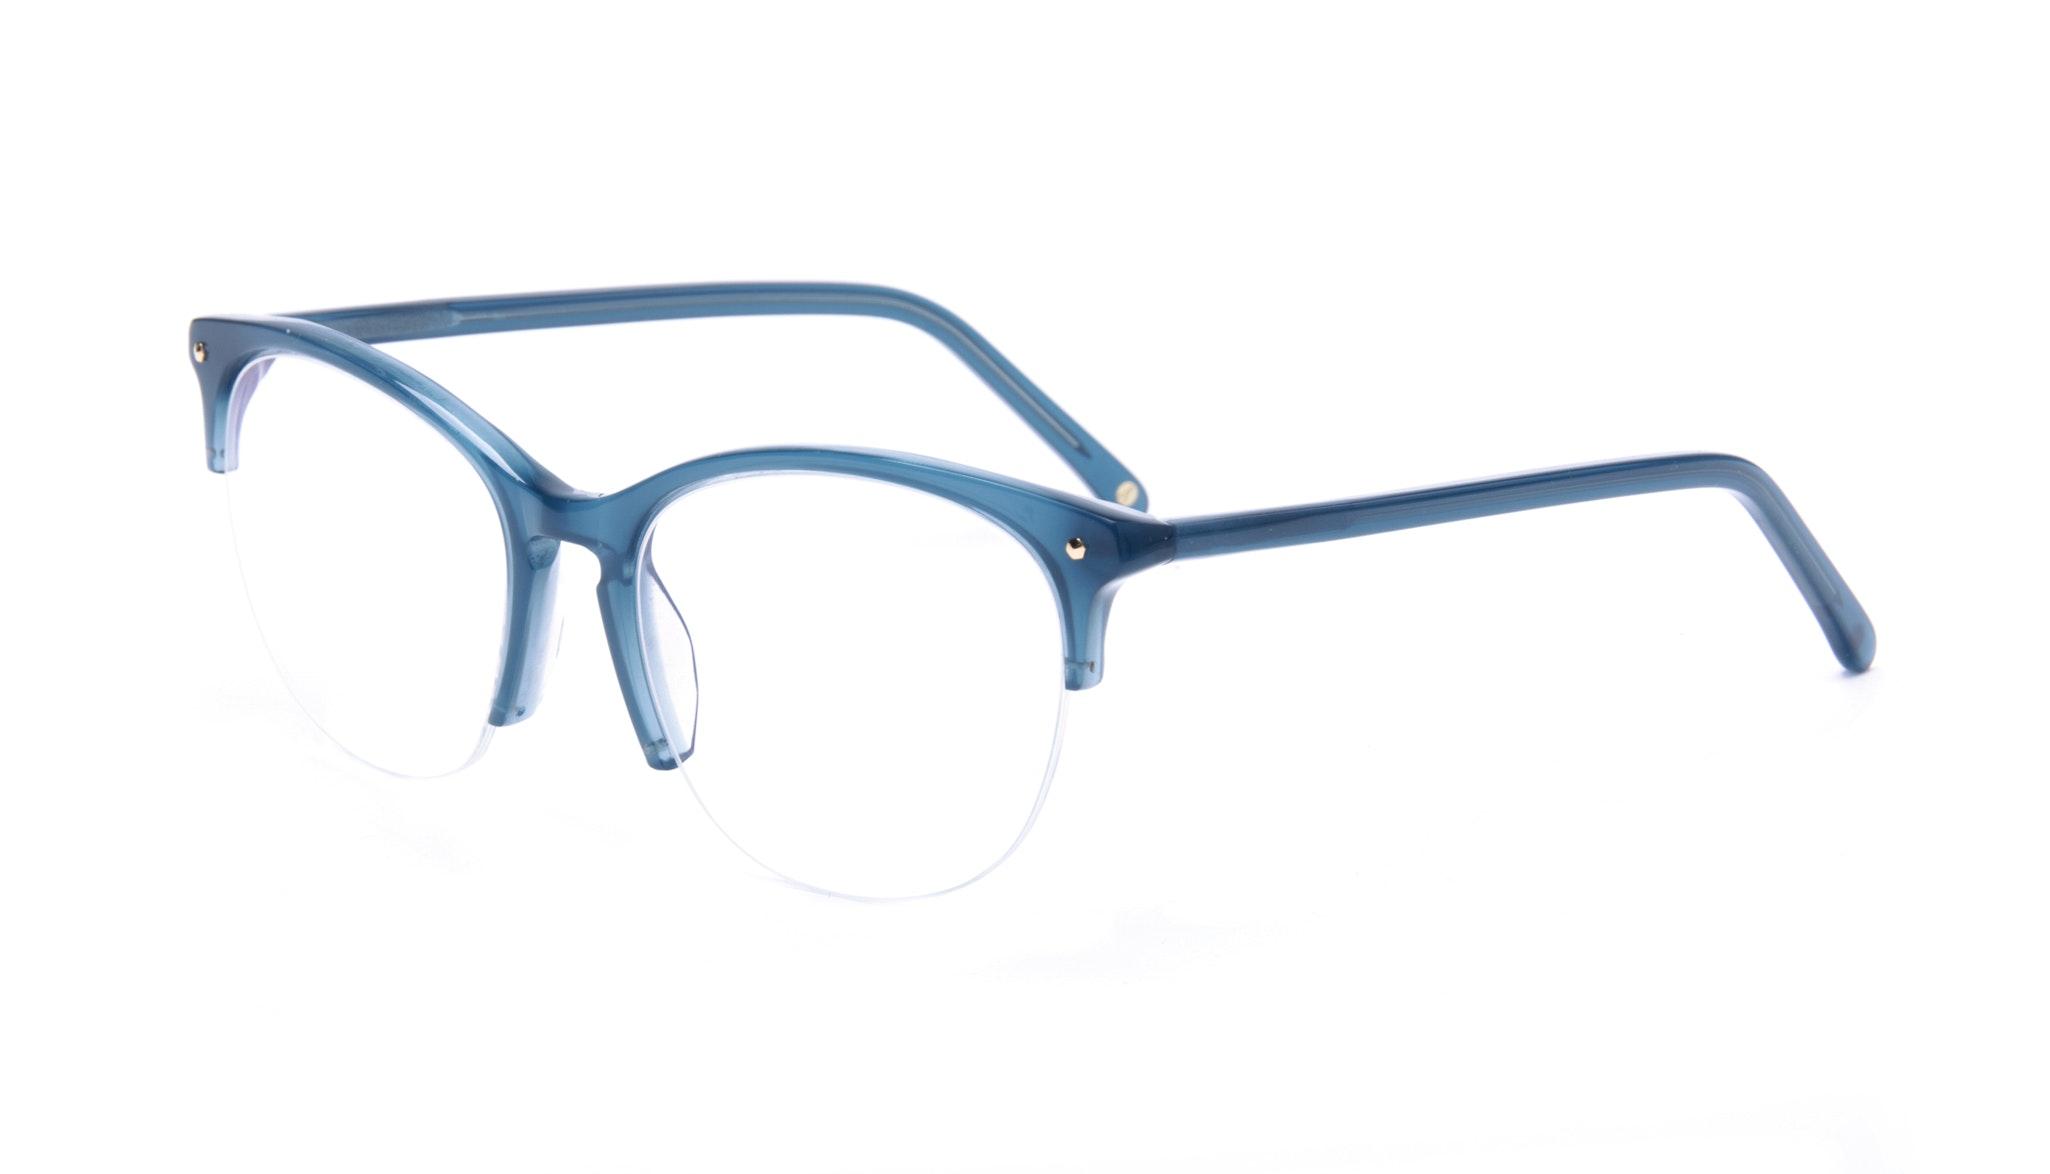 Affordable Fashion Glasses Rectangle Round Eyeglasses Women Nadine Light Marine Tilt